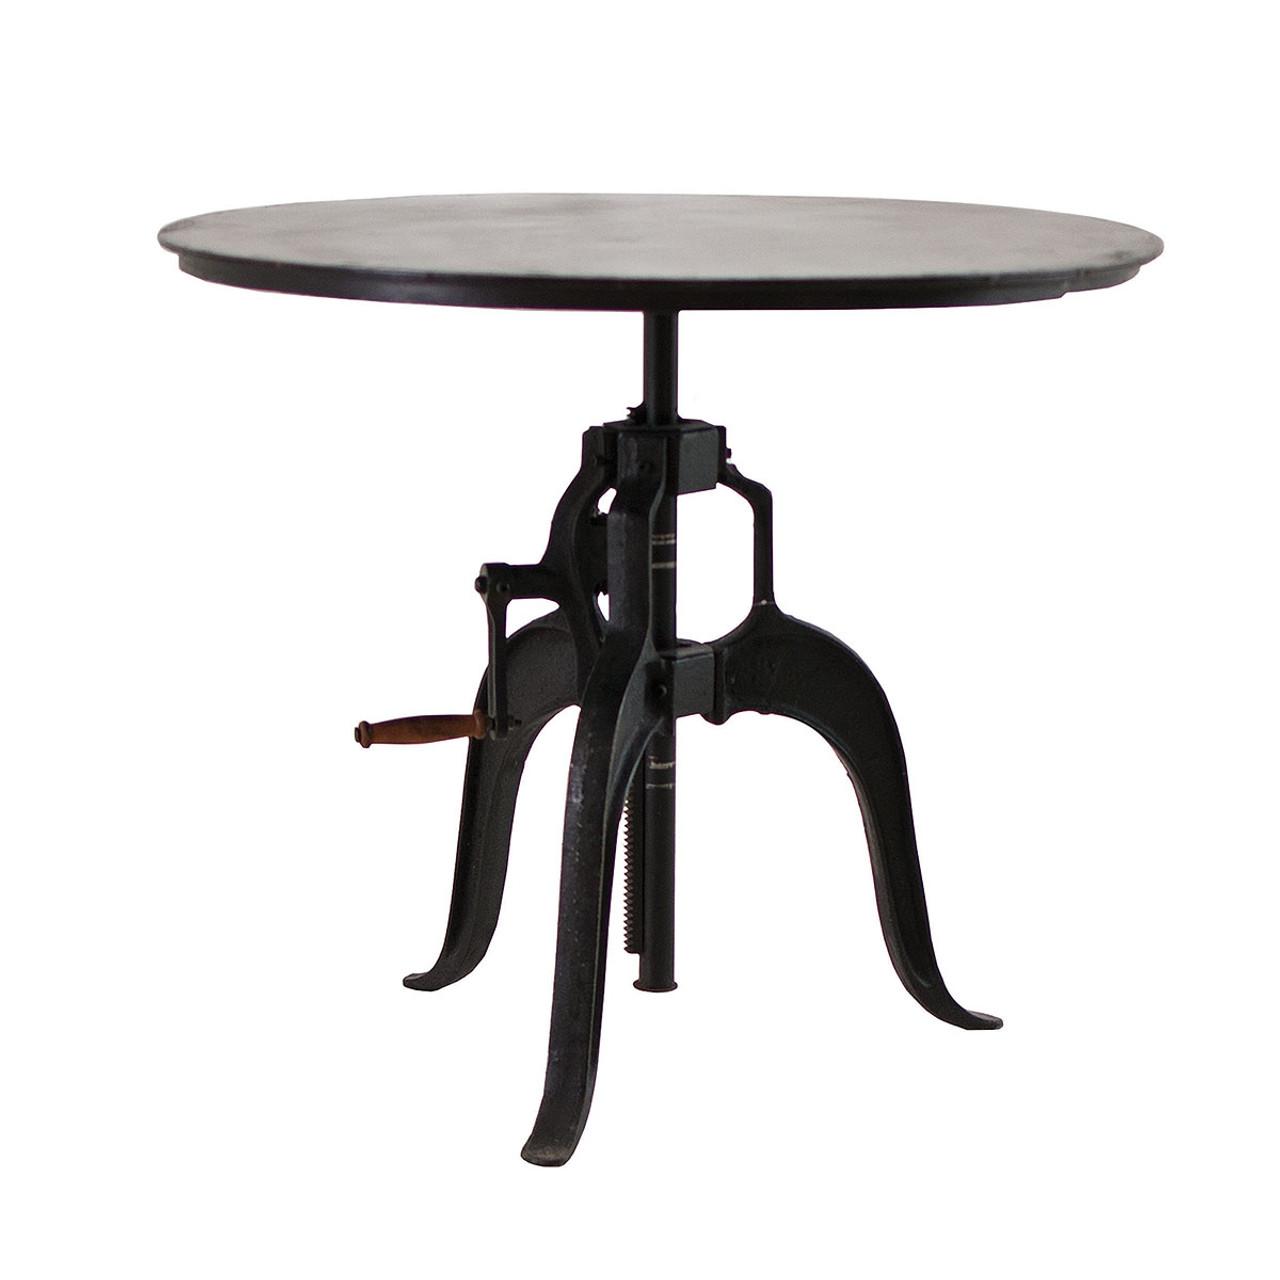 Adjustable Height Crank Dining Table 36   sc 1 st  Zin Home & Adjustable Height Crank Dining Table 36